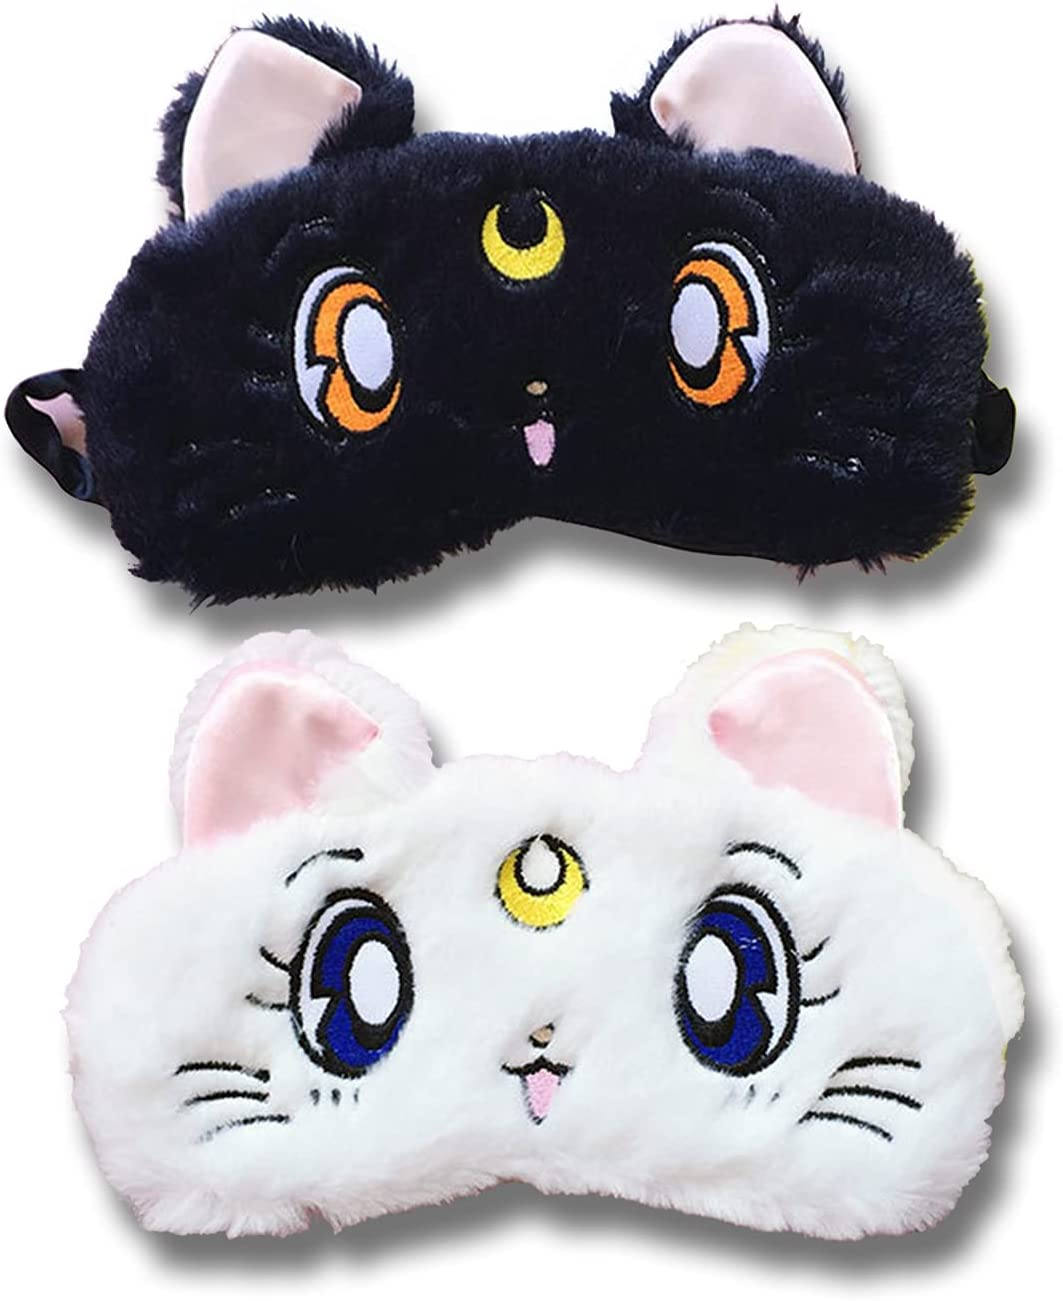 Sailor Moon Sleeping Mask Max 65% OFF 2 Cheap mail order sales Pack Blindfold Plush Mas Girls Soft